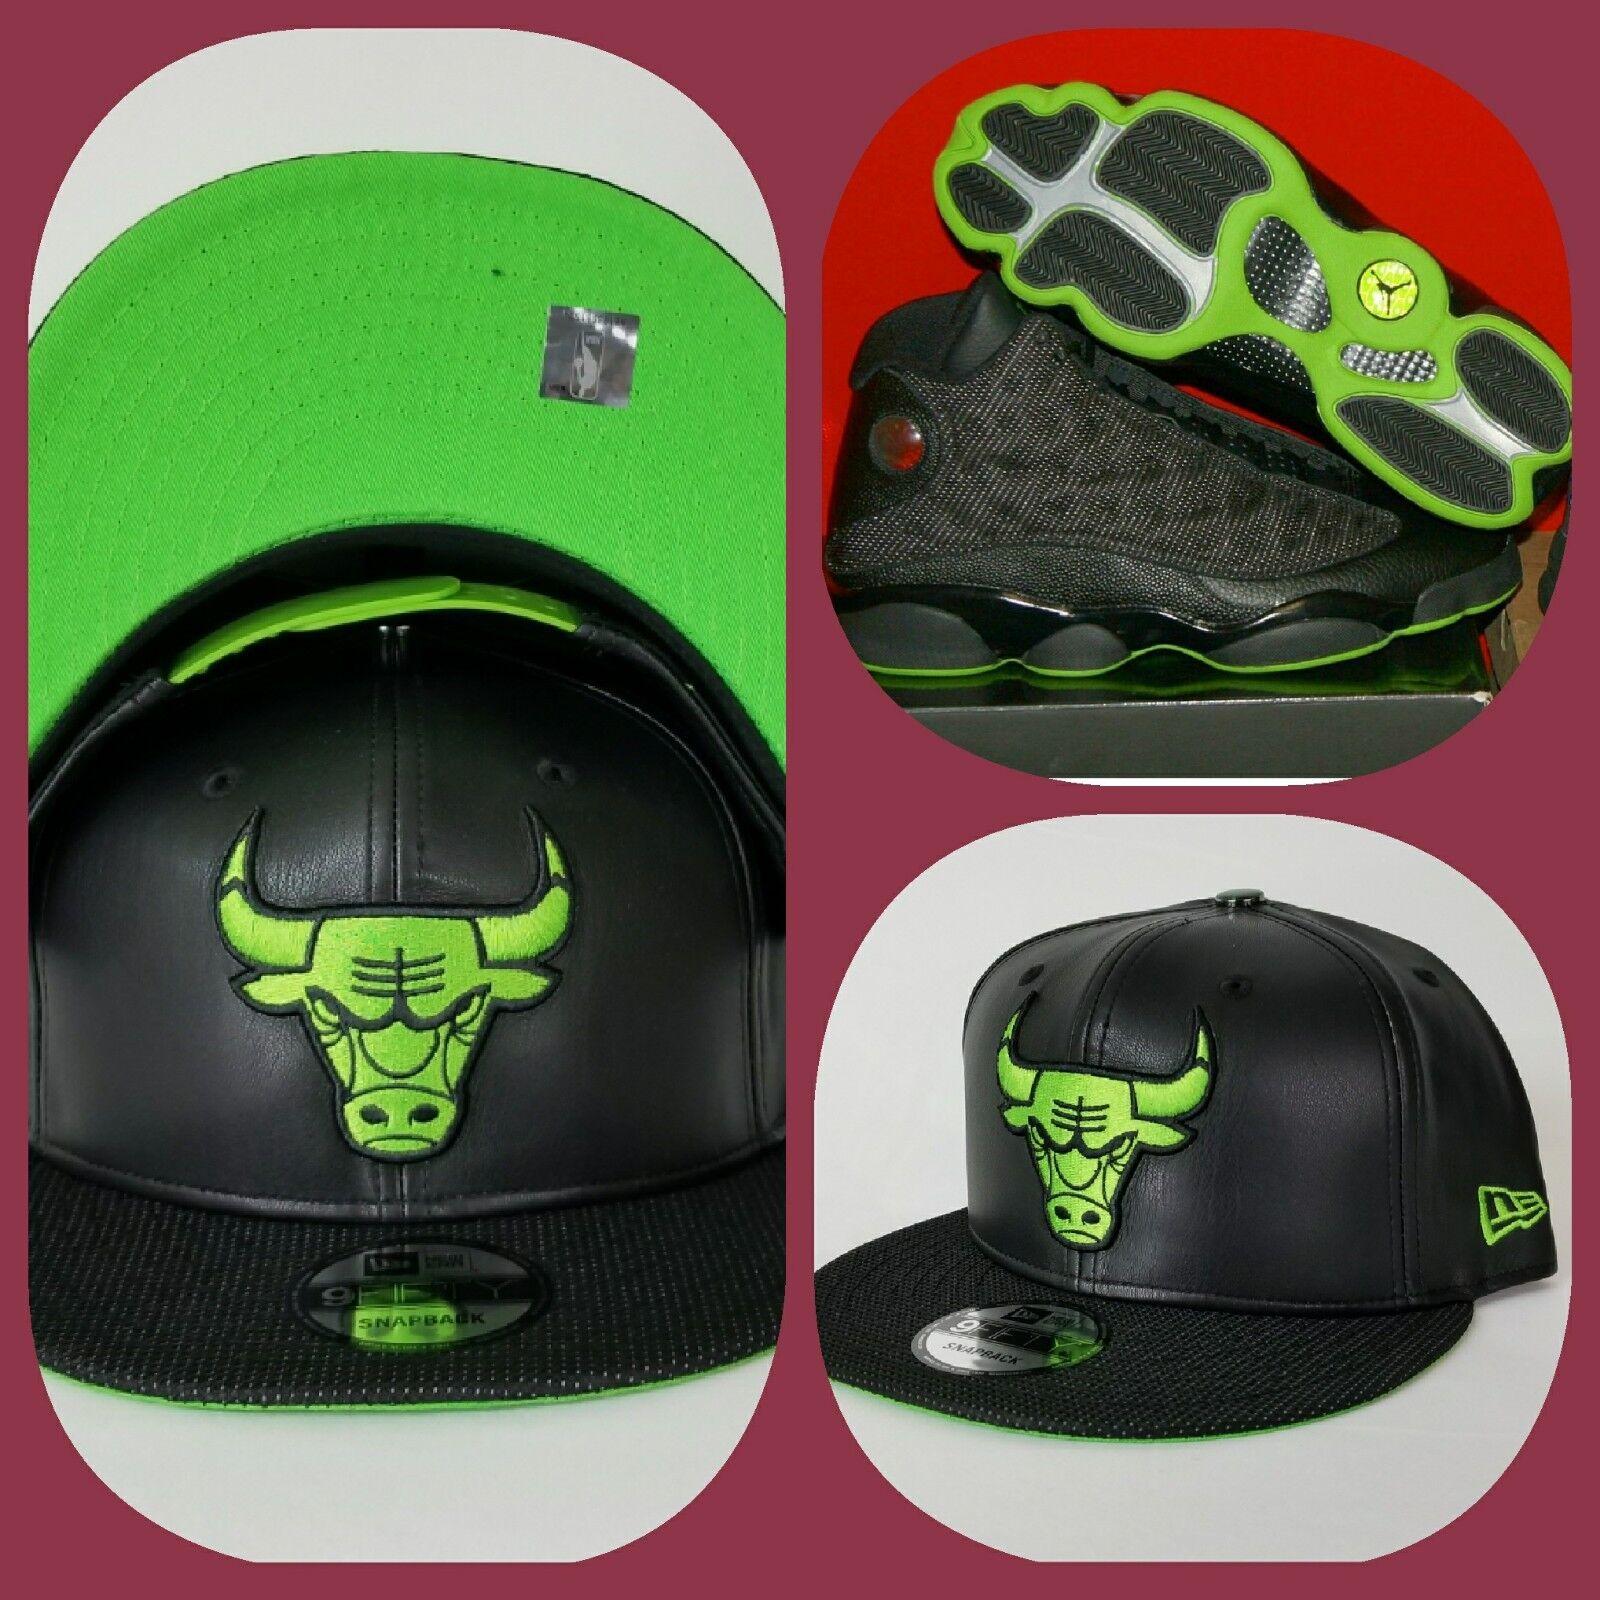 Details about New Era Chicago Bulls Black Faux Leather snapback hat Jordan  13 Altitude Green 512e90cdd2d